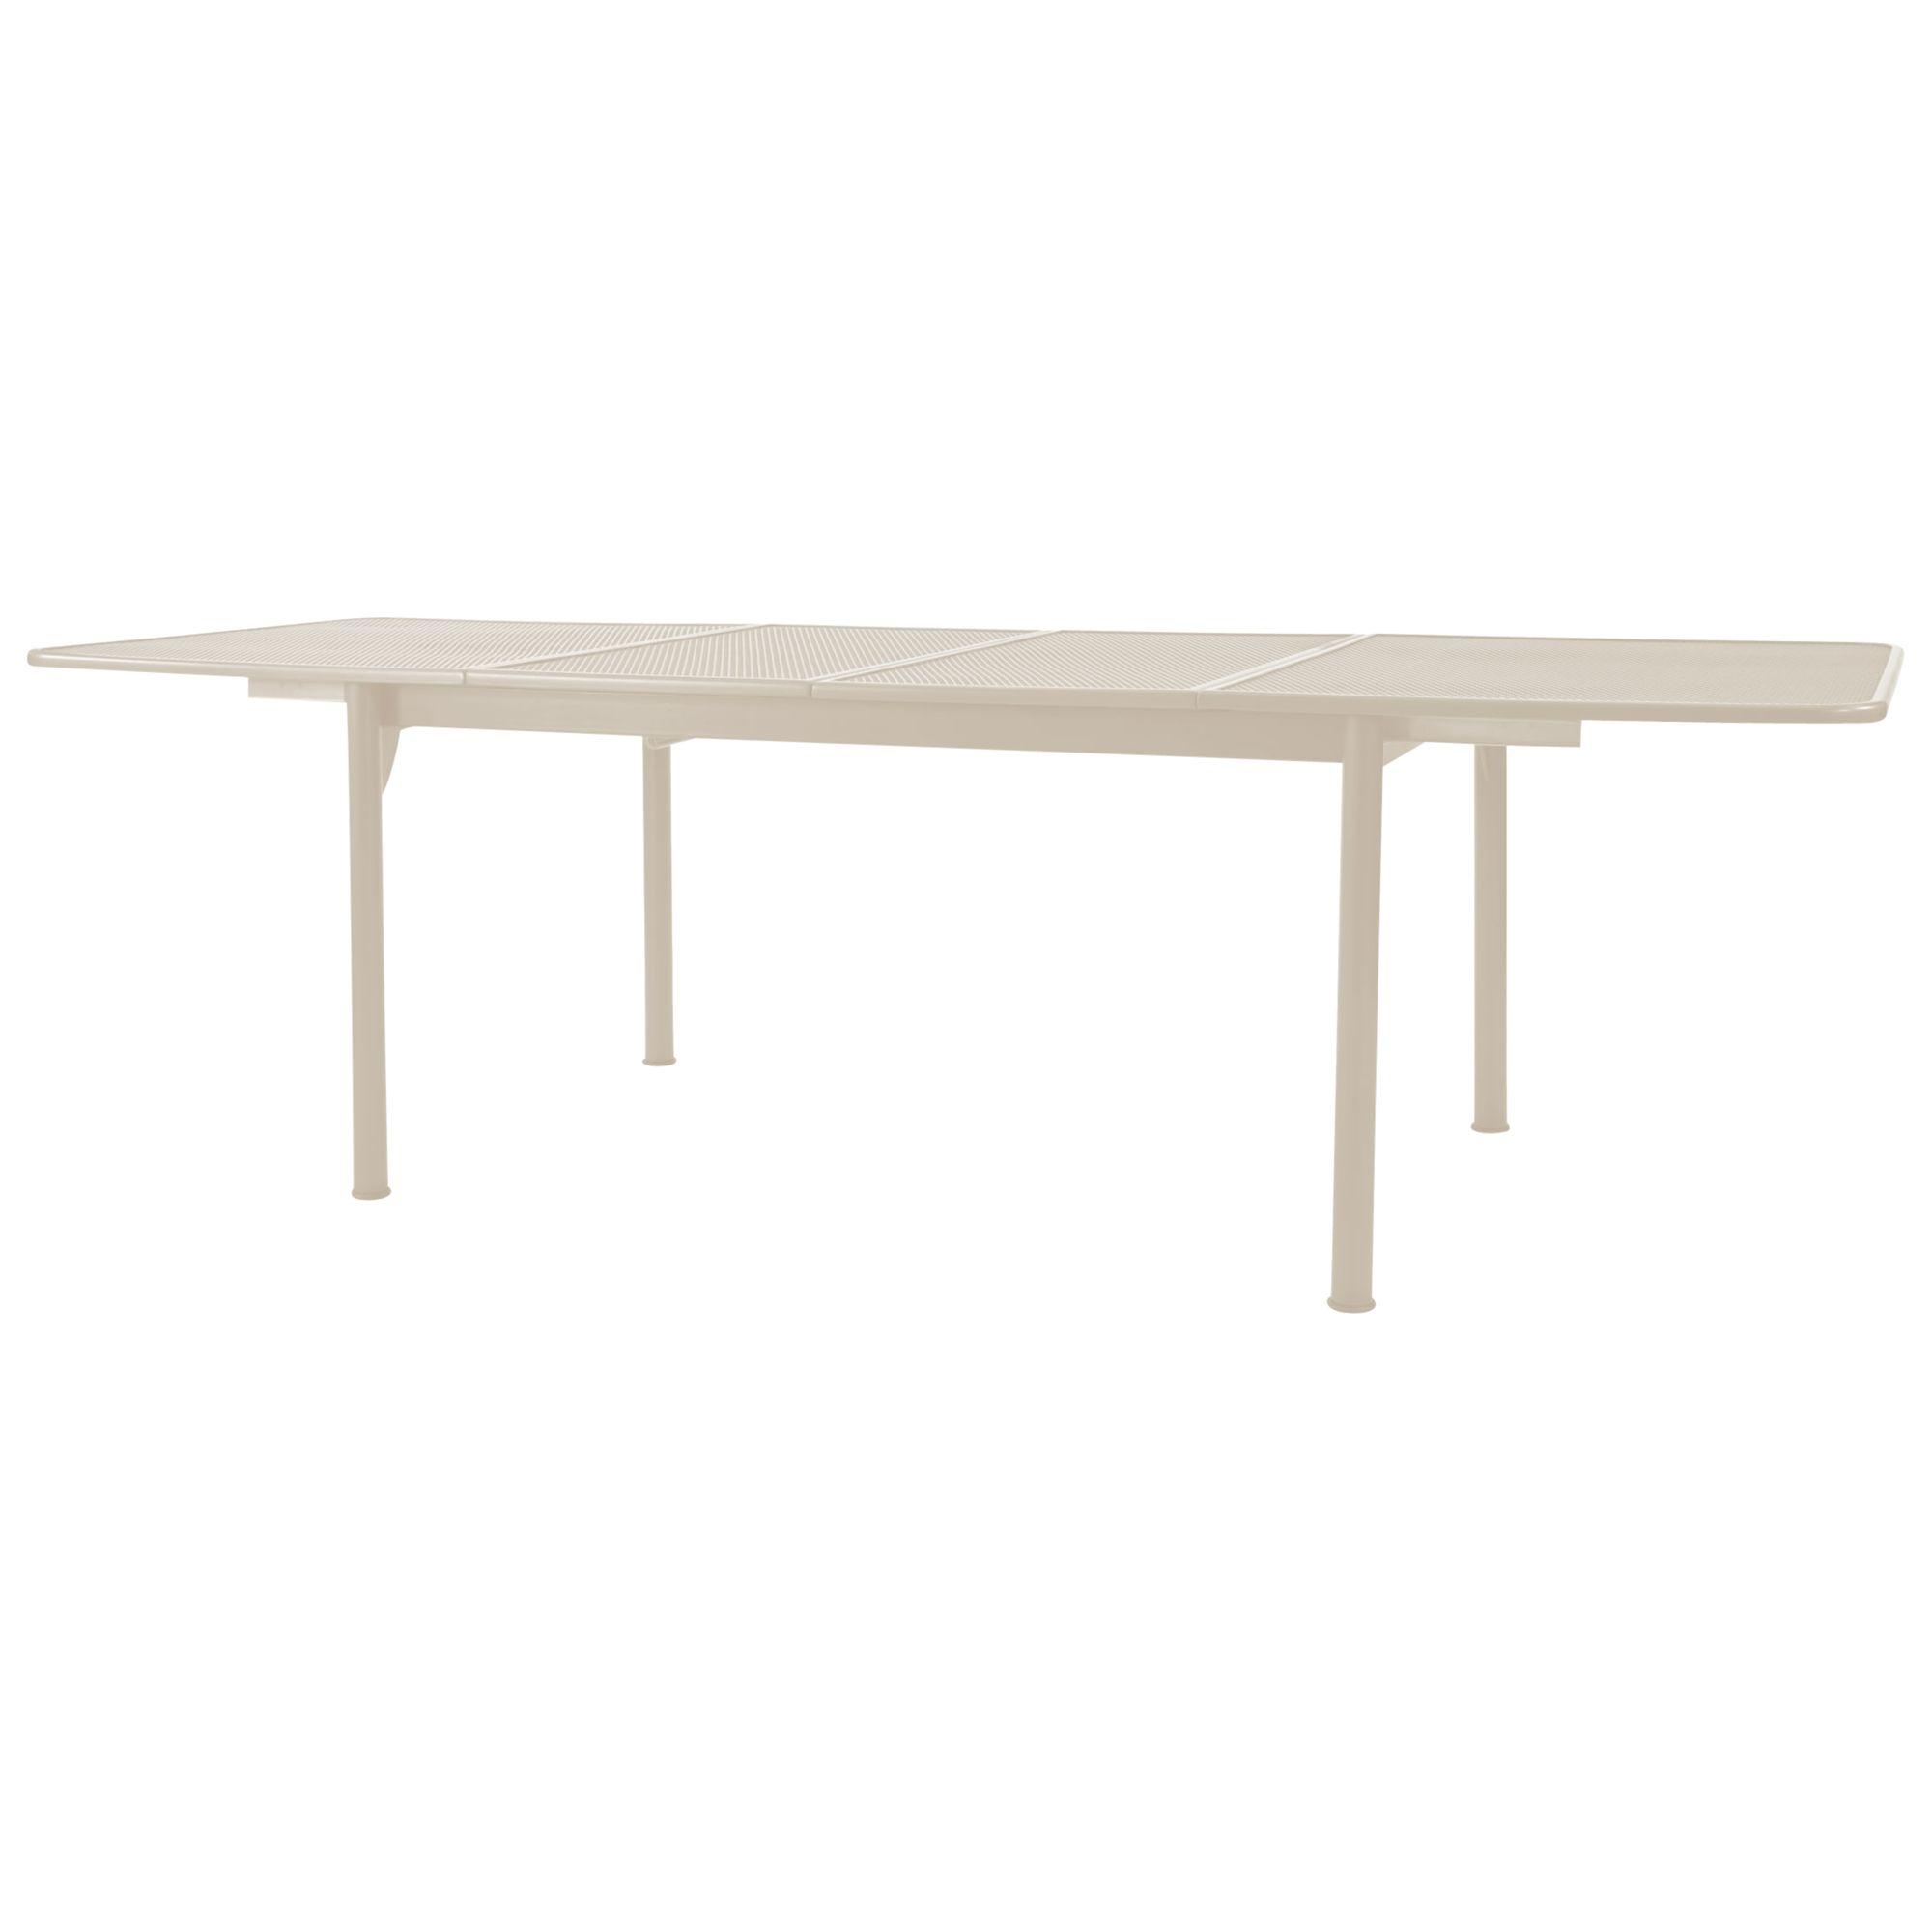 John Lewis Henley by KETTLER John Lewis Henley by KETTLER Rectangular 6-8 Seater Extending Outdoor Dining Table